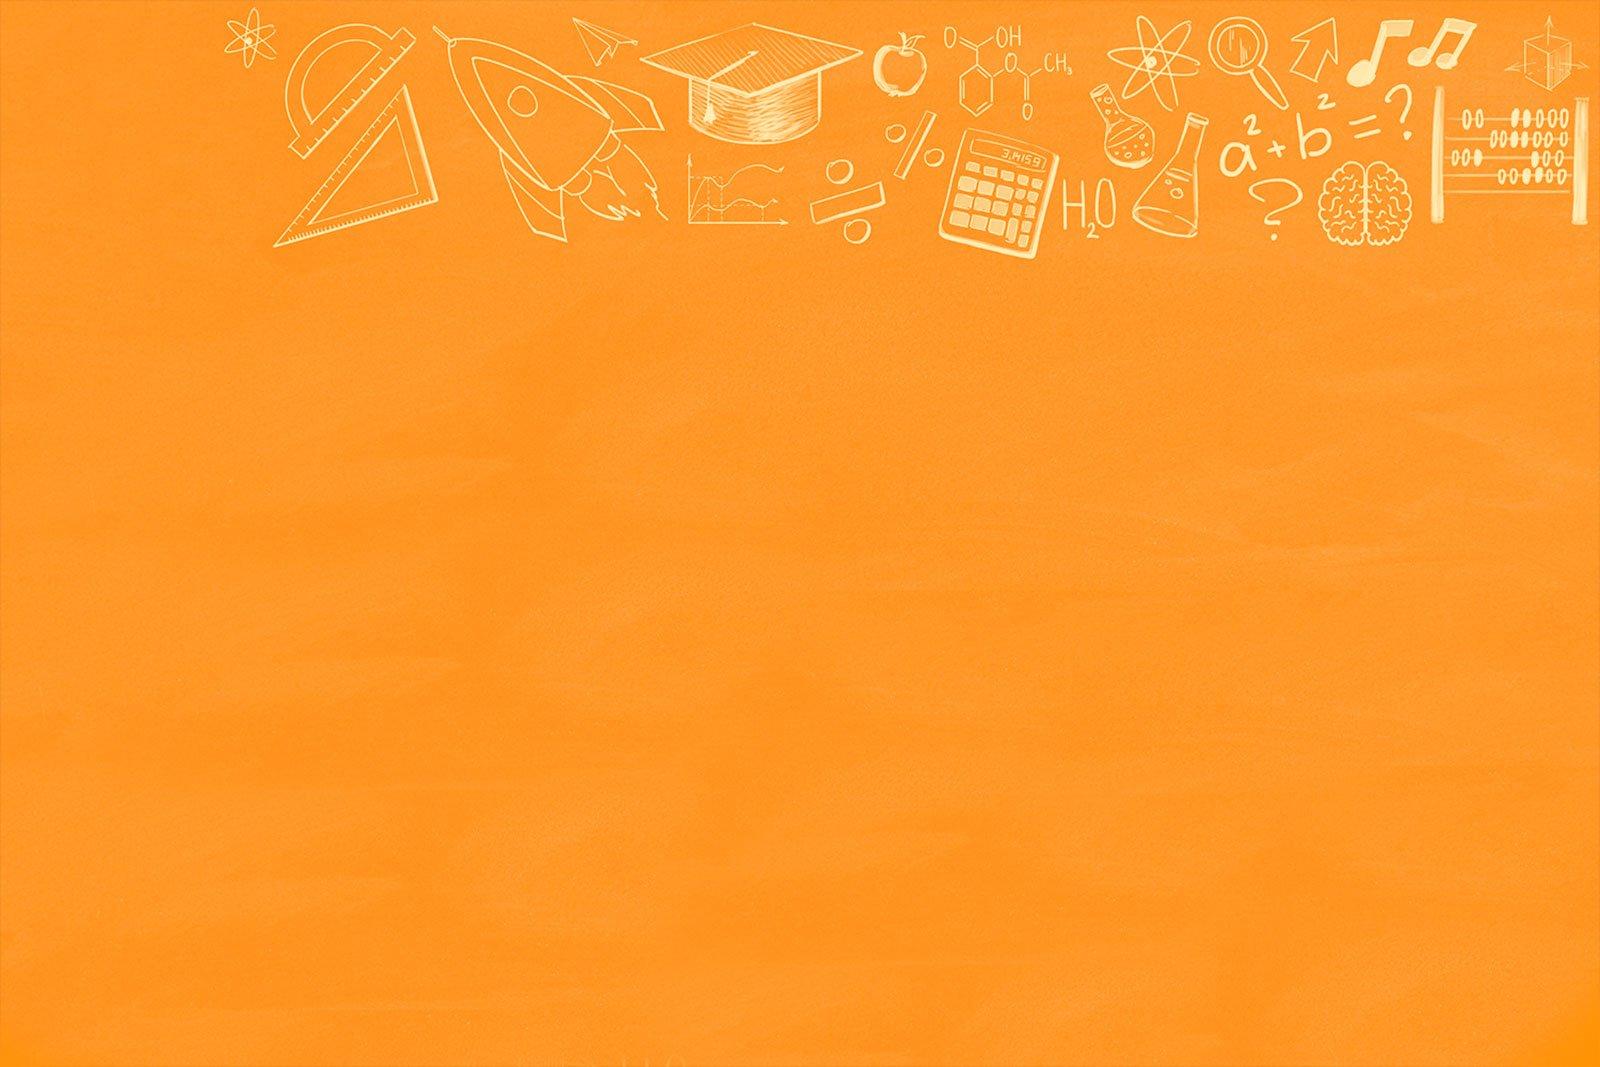 Orange-Bundles-BG---Optimized